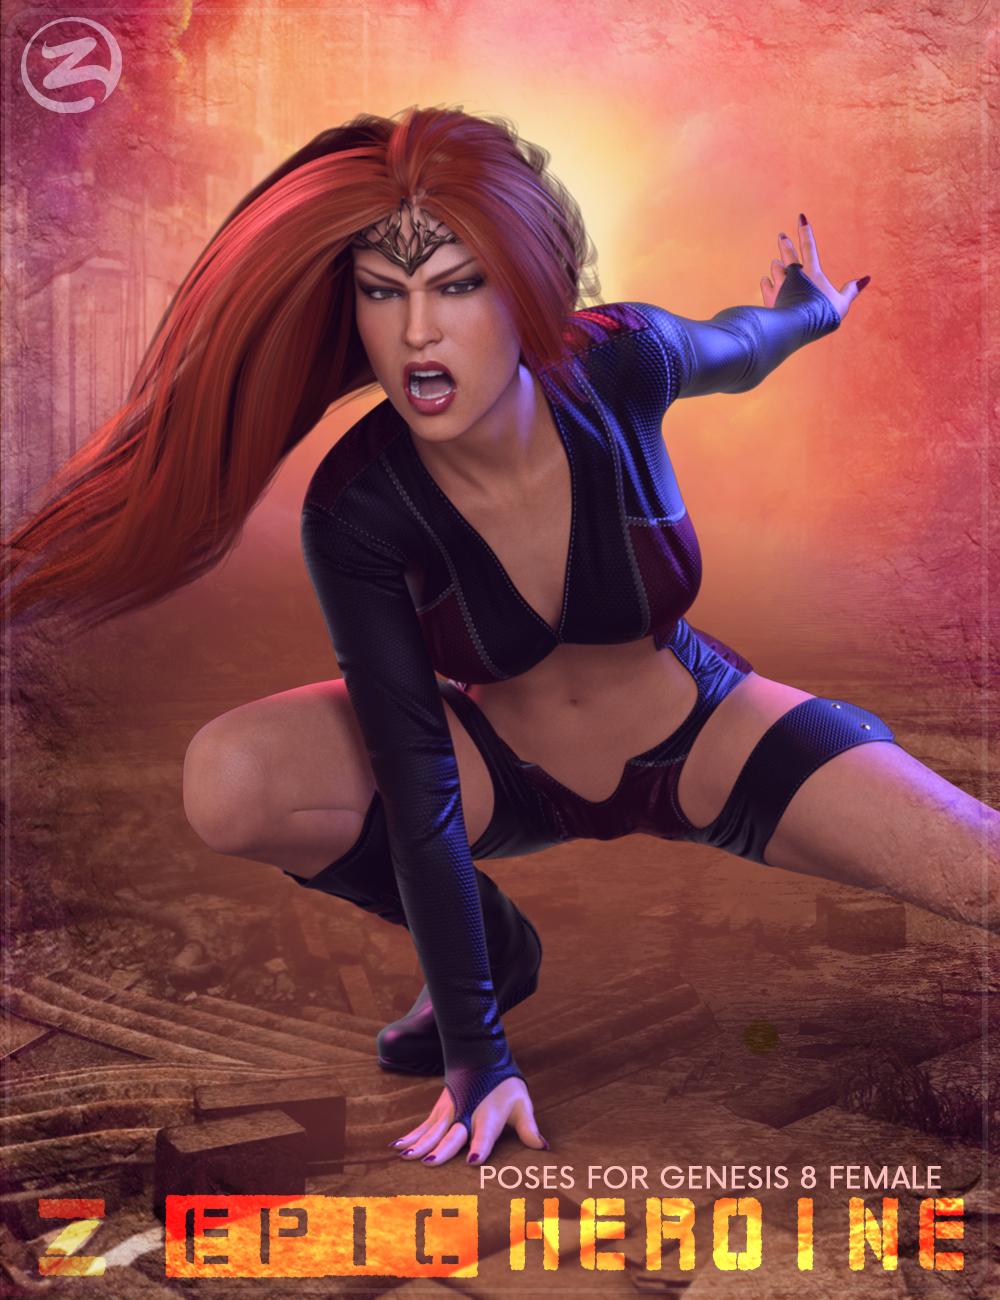 Z Epic Heroine Poses for Genesis 8 Female by: Zeddicuss, 3D Models by Daz 3D